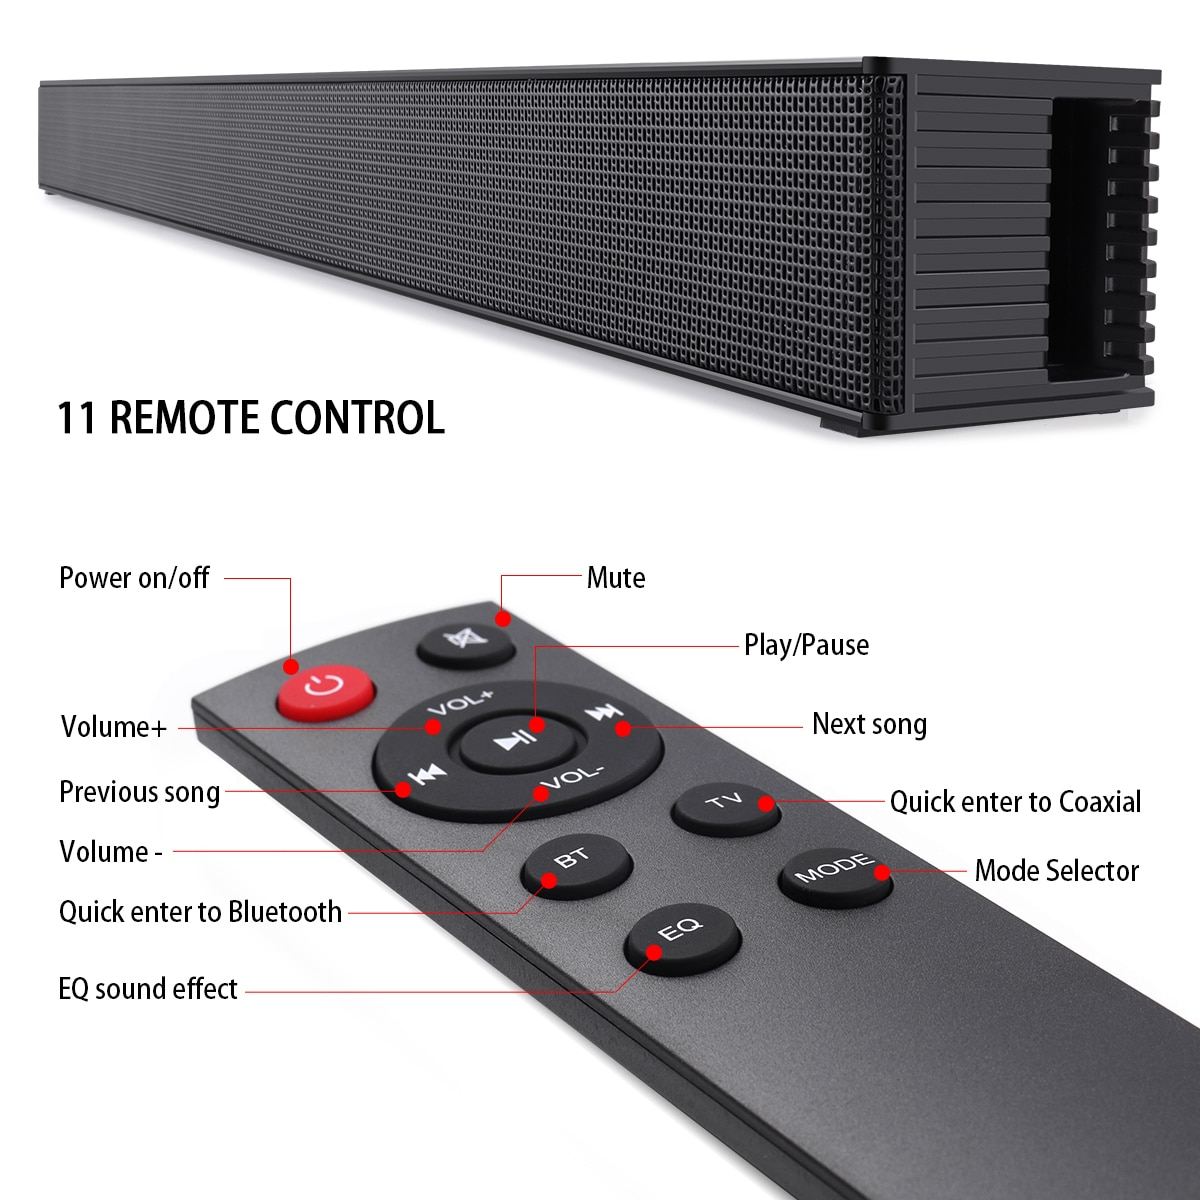 Beastun TV Soundbar Home Theater 40W Wireless Stereo Speaker Optical Coax ARC AUX Bluetooth Sound Bar Subwoofer for TV PC iPhone enlarge